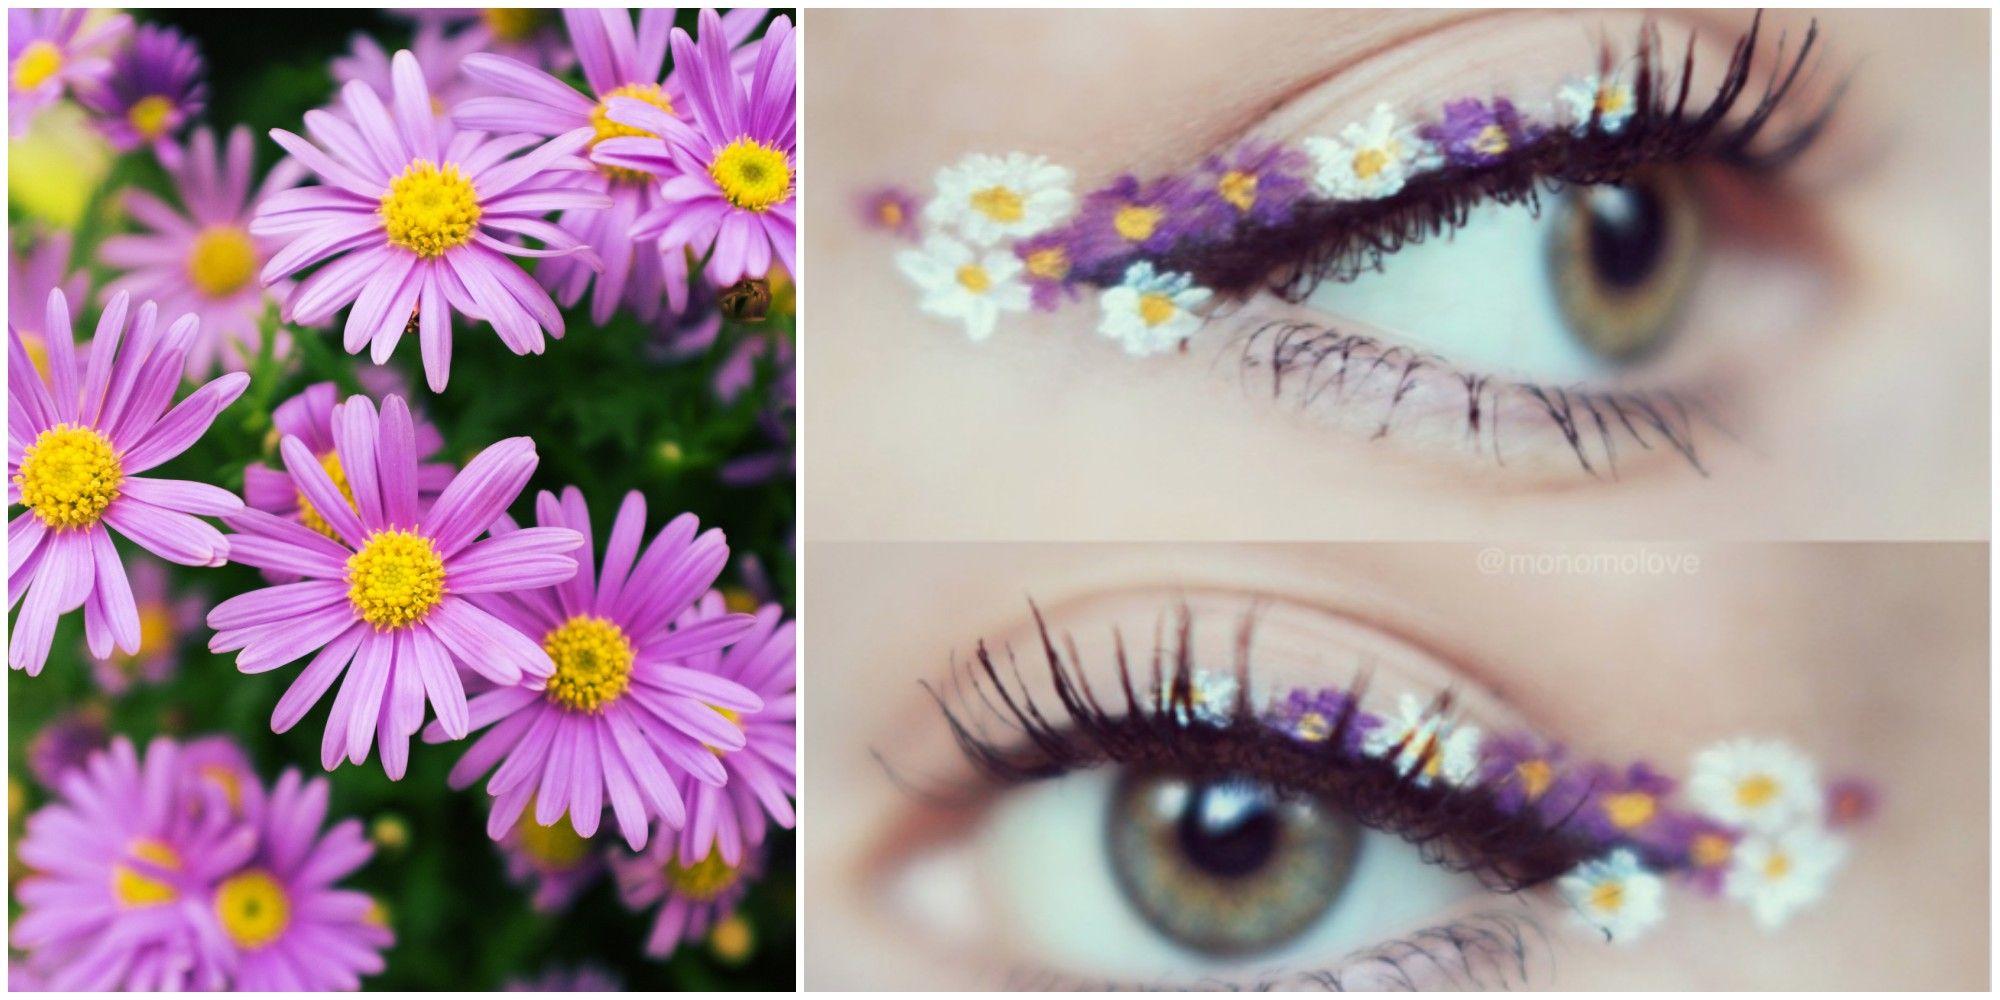 Easter Makeup Flower Eyeliner Flowerliner